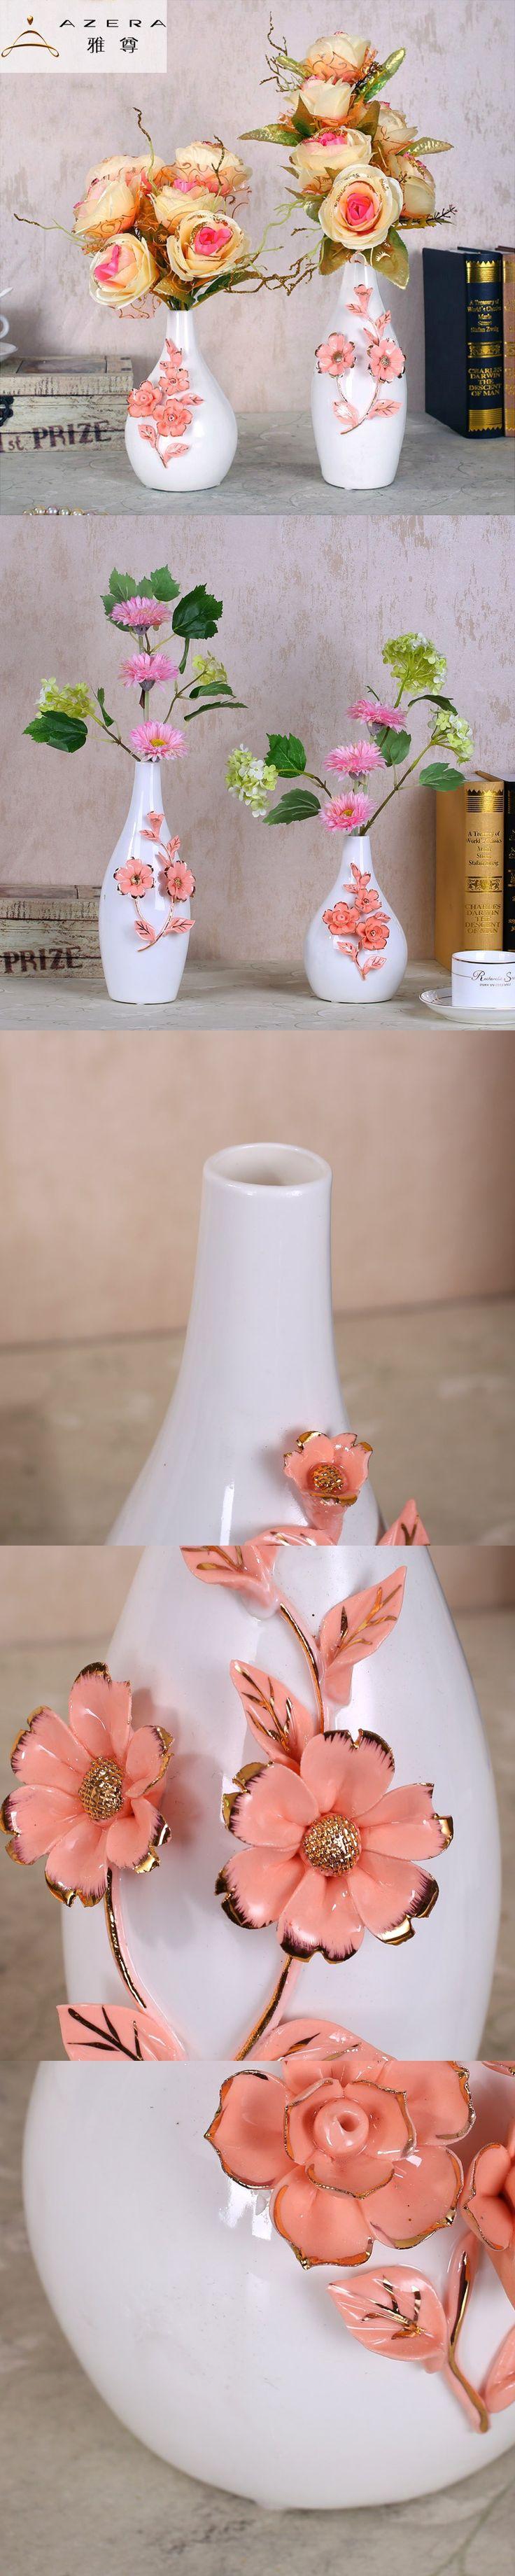 Modern minimalist Decor white ceramic vase Home Furnishing living room table small TV cabinet decoration wedding gift $124.19